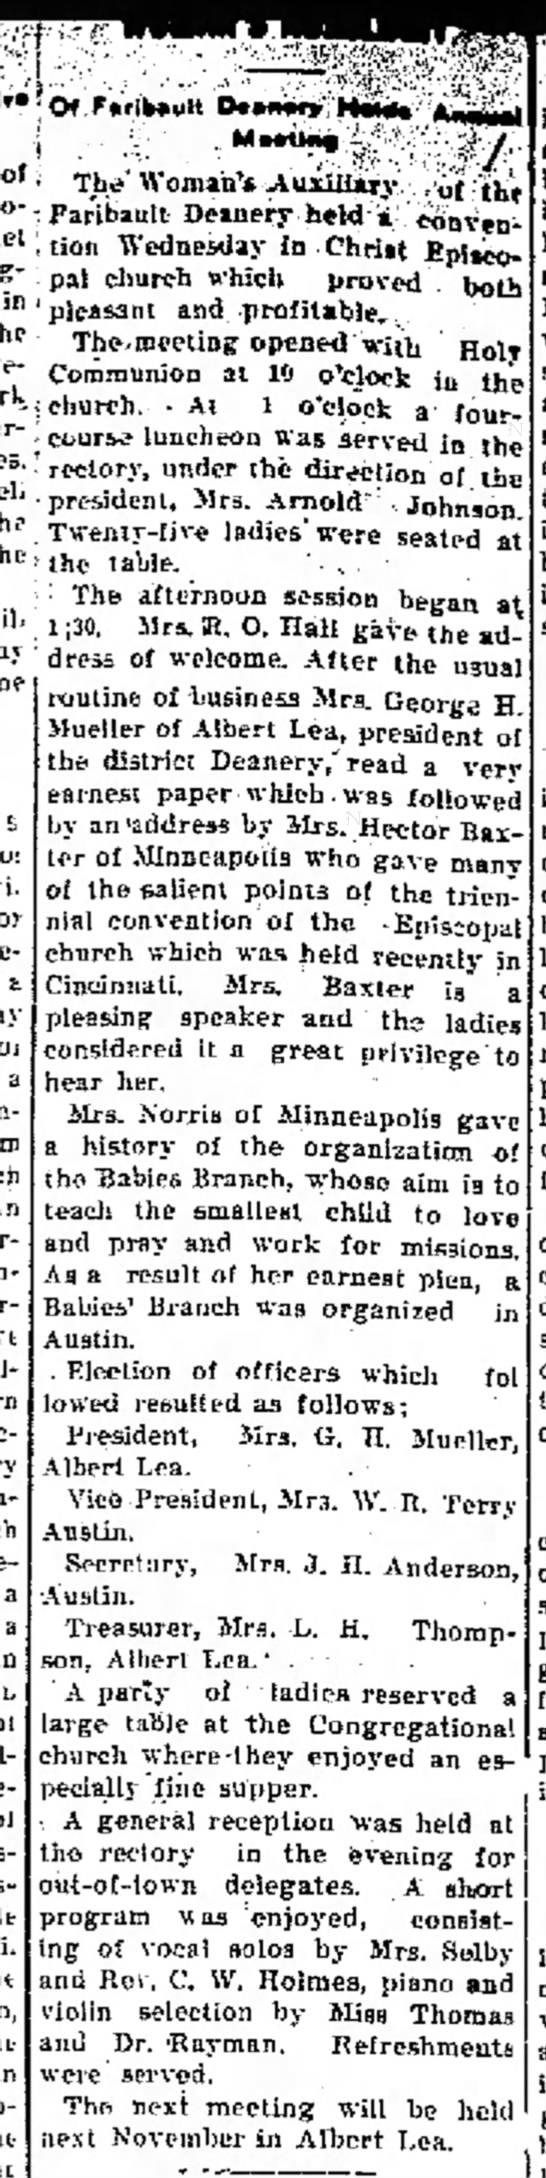 Austin Daily Herald 10 Nov 1910 p. 2 -